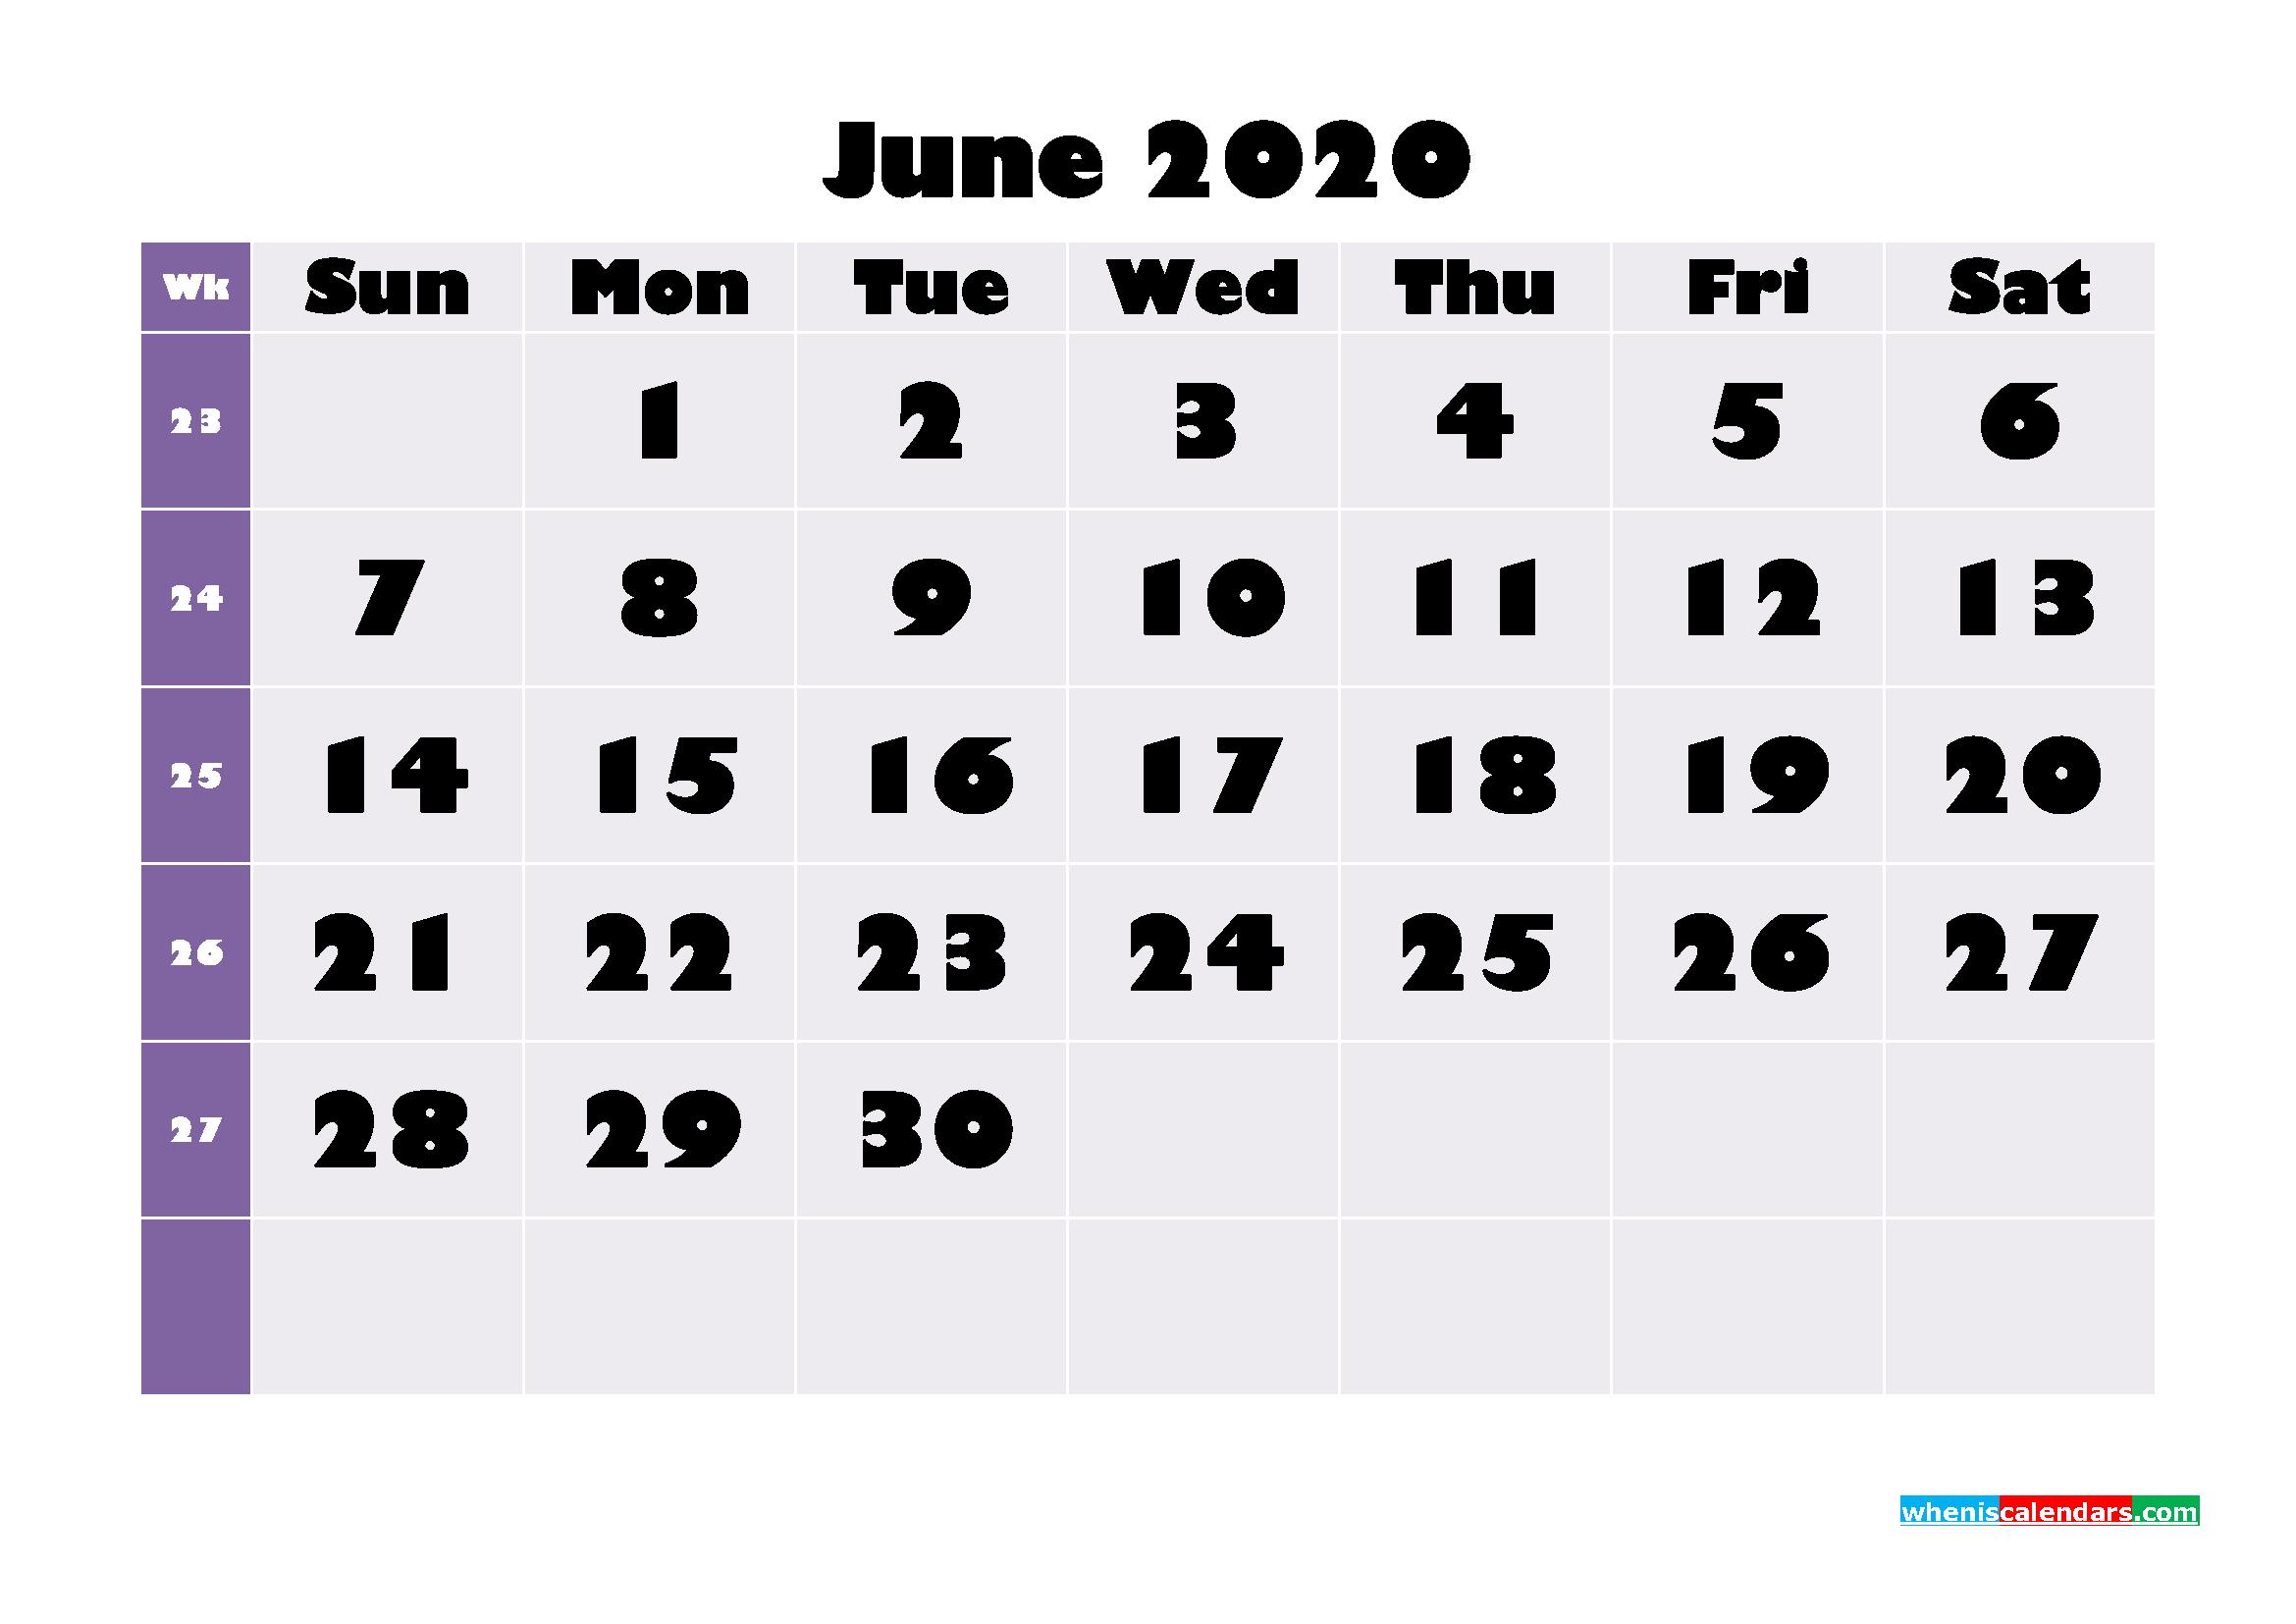 Free Printable June 2020 Calendar - No.m20b678